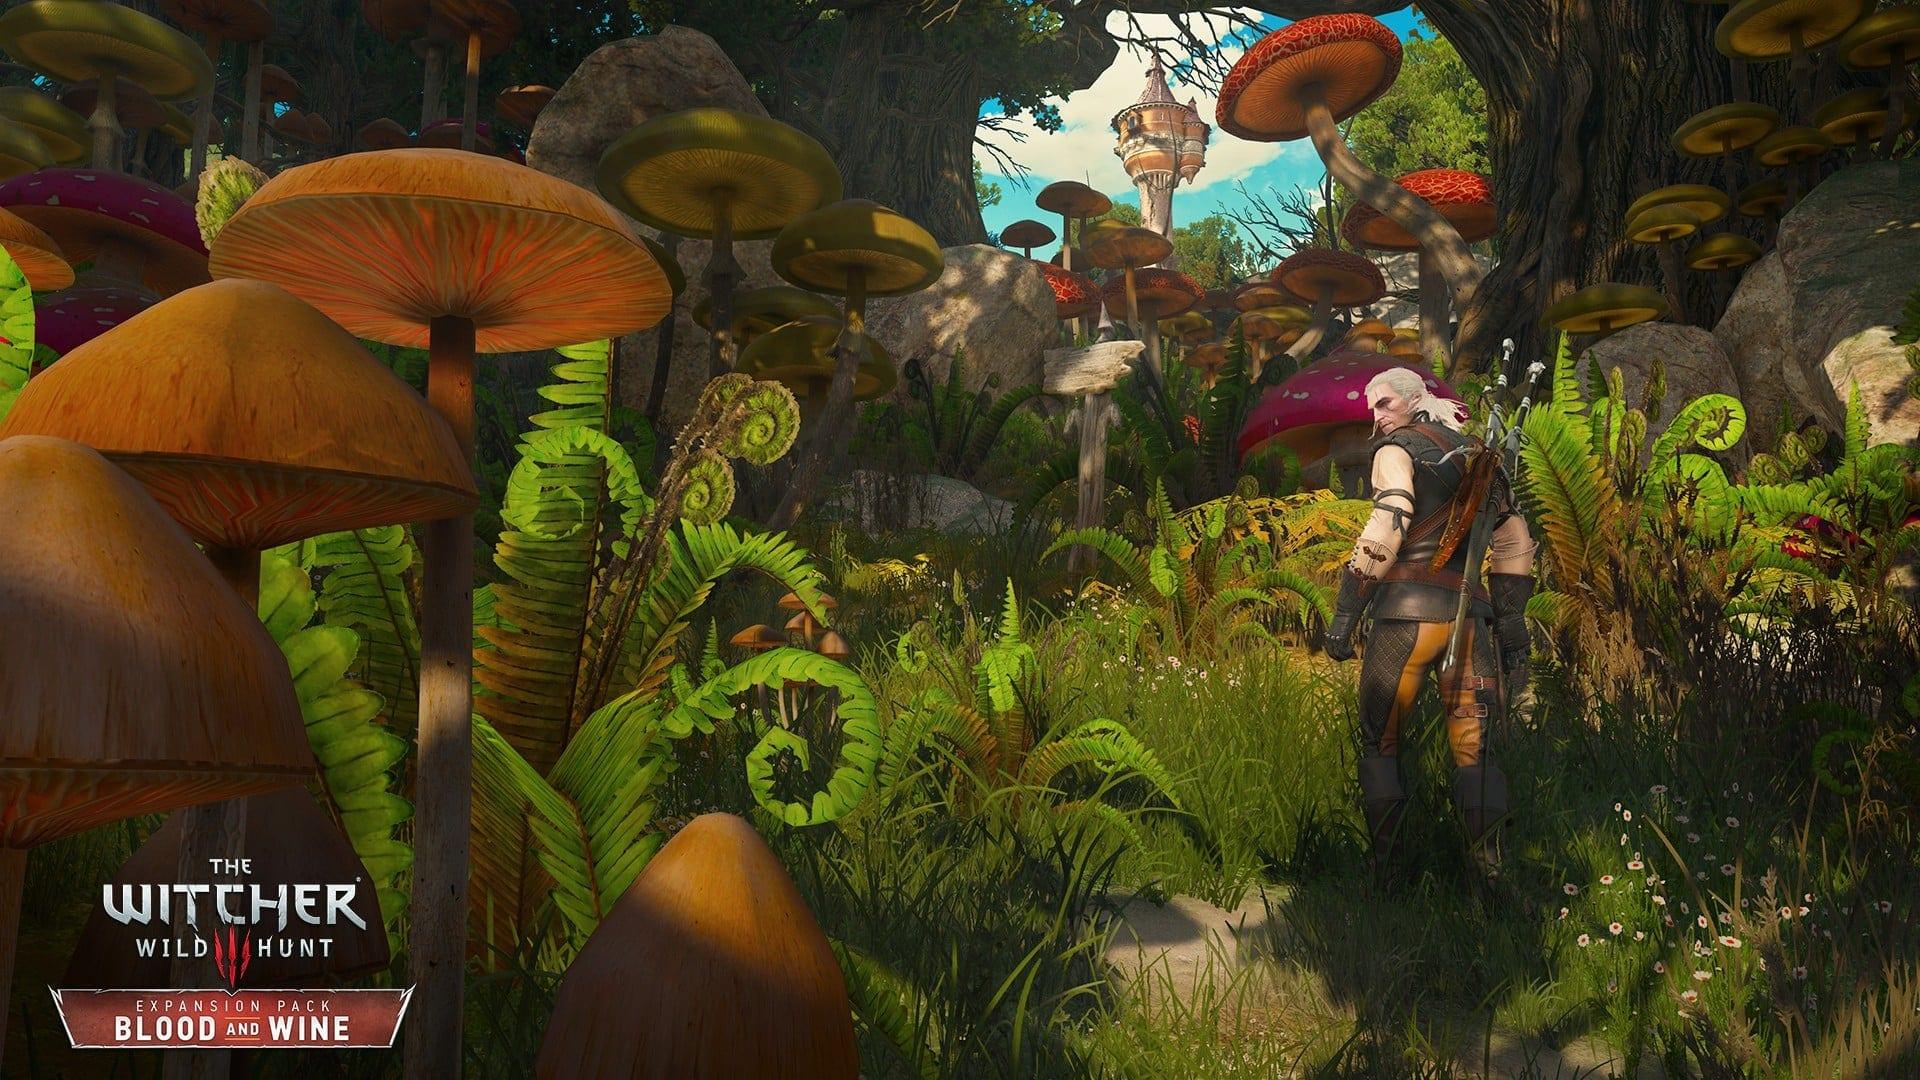 The Witcher 3: Wild Hunt, nuove immagini dell'espansione Blood and Wine 3